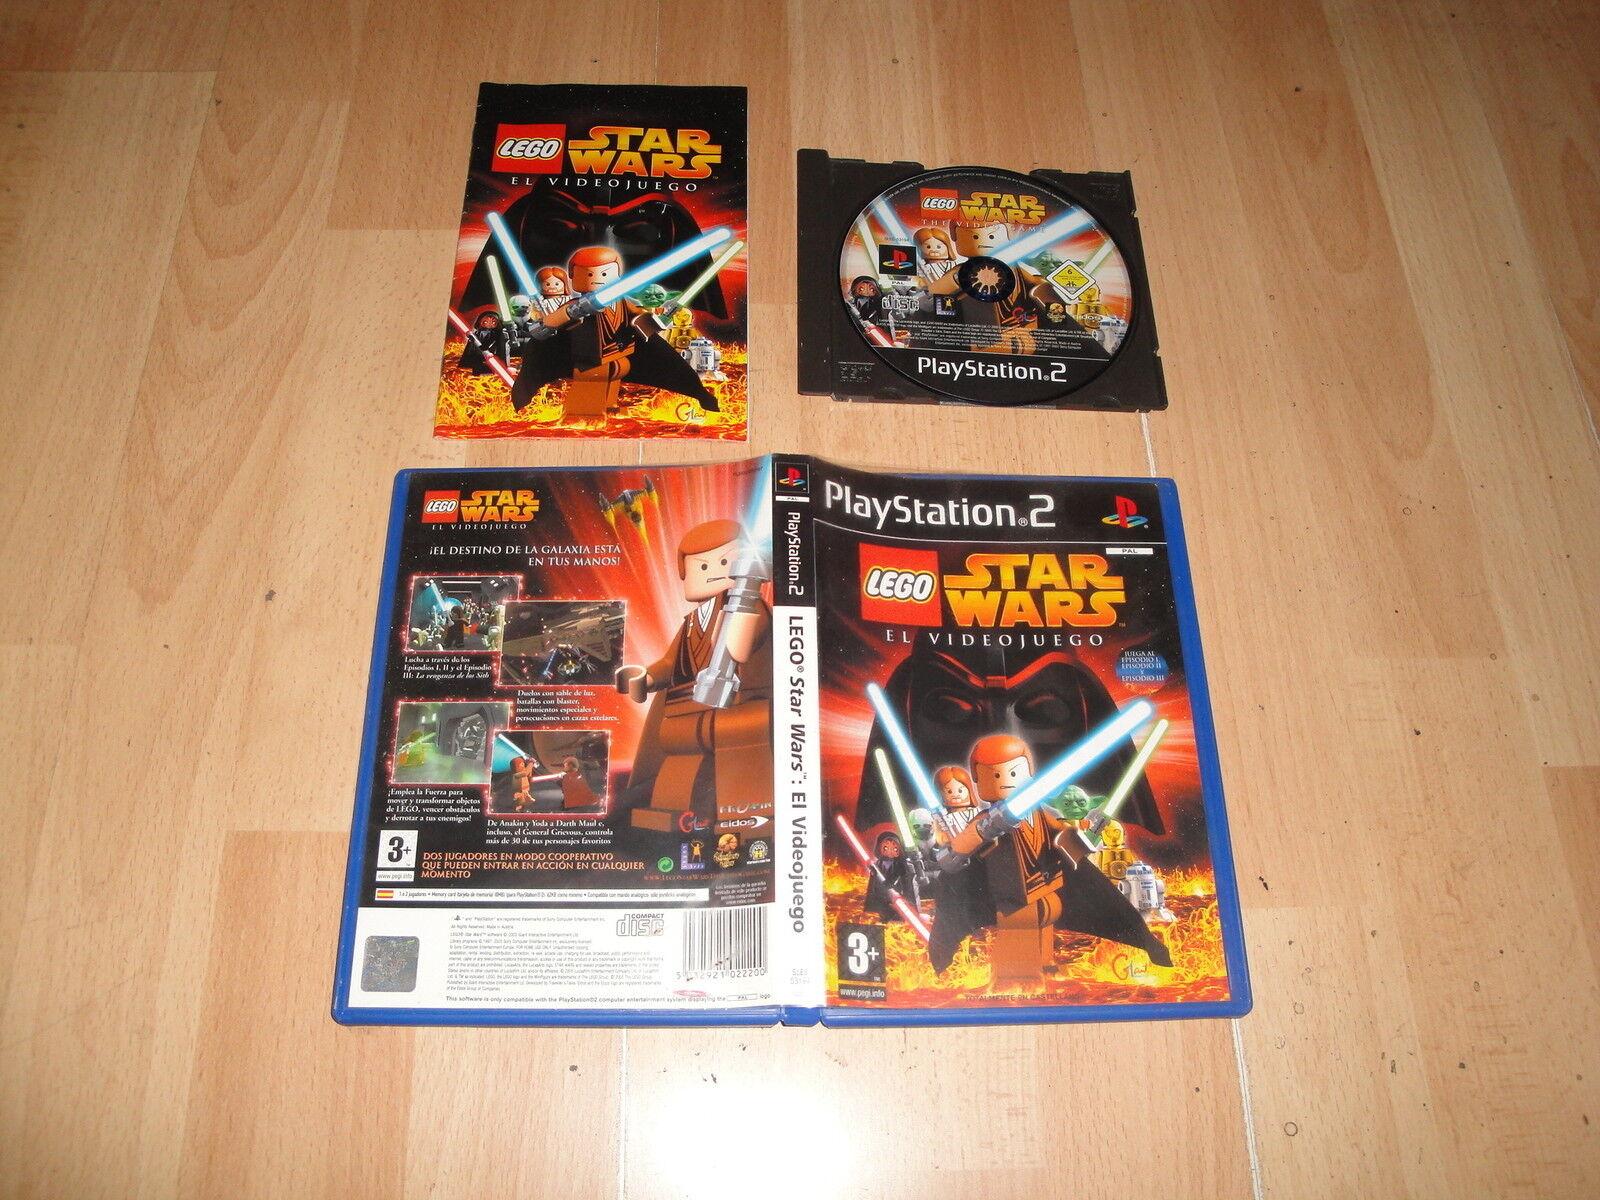 LEGO STAR WARS EL VIDEOJUEGO DE TRAVELLER'S - jeu StarWars